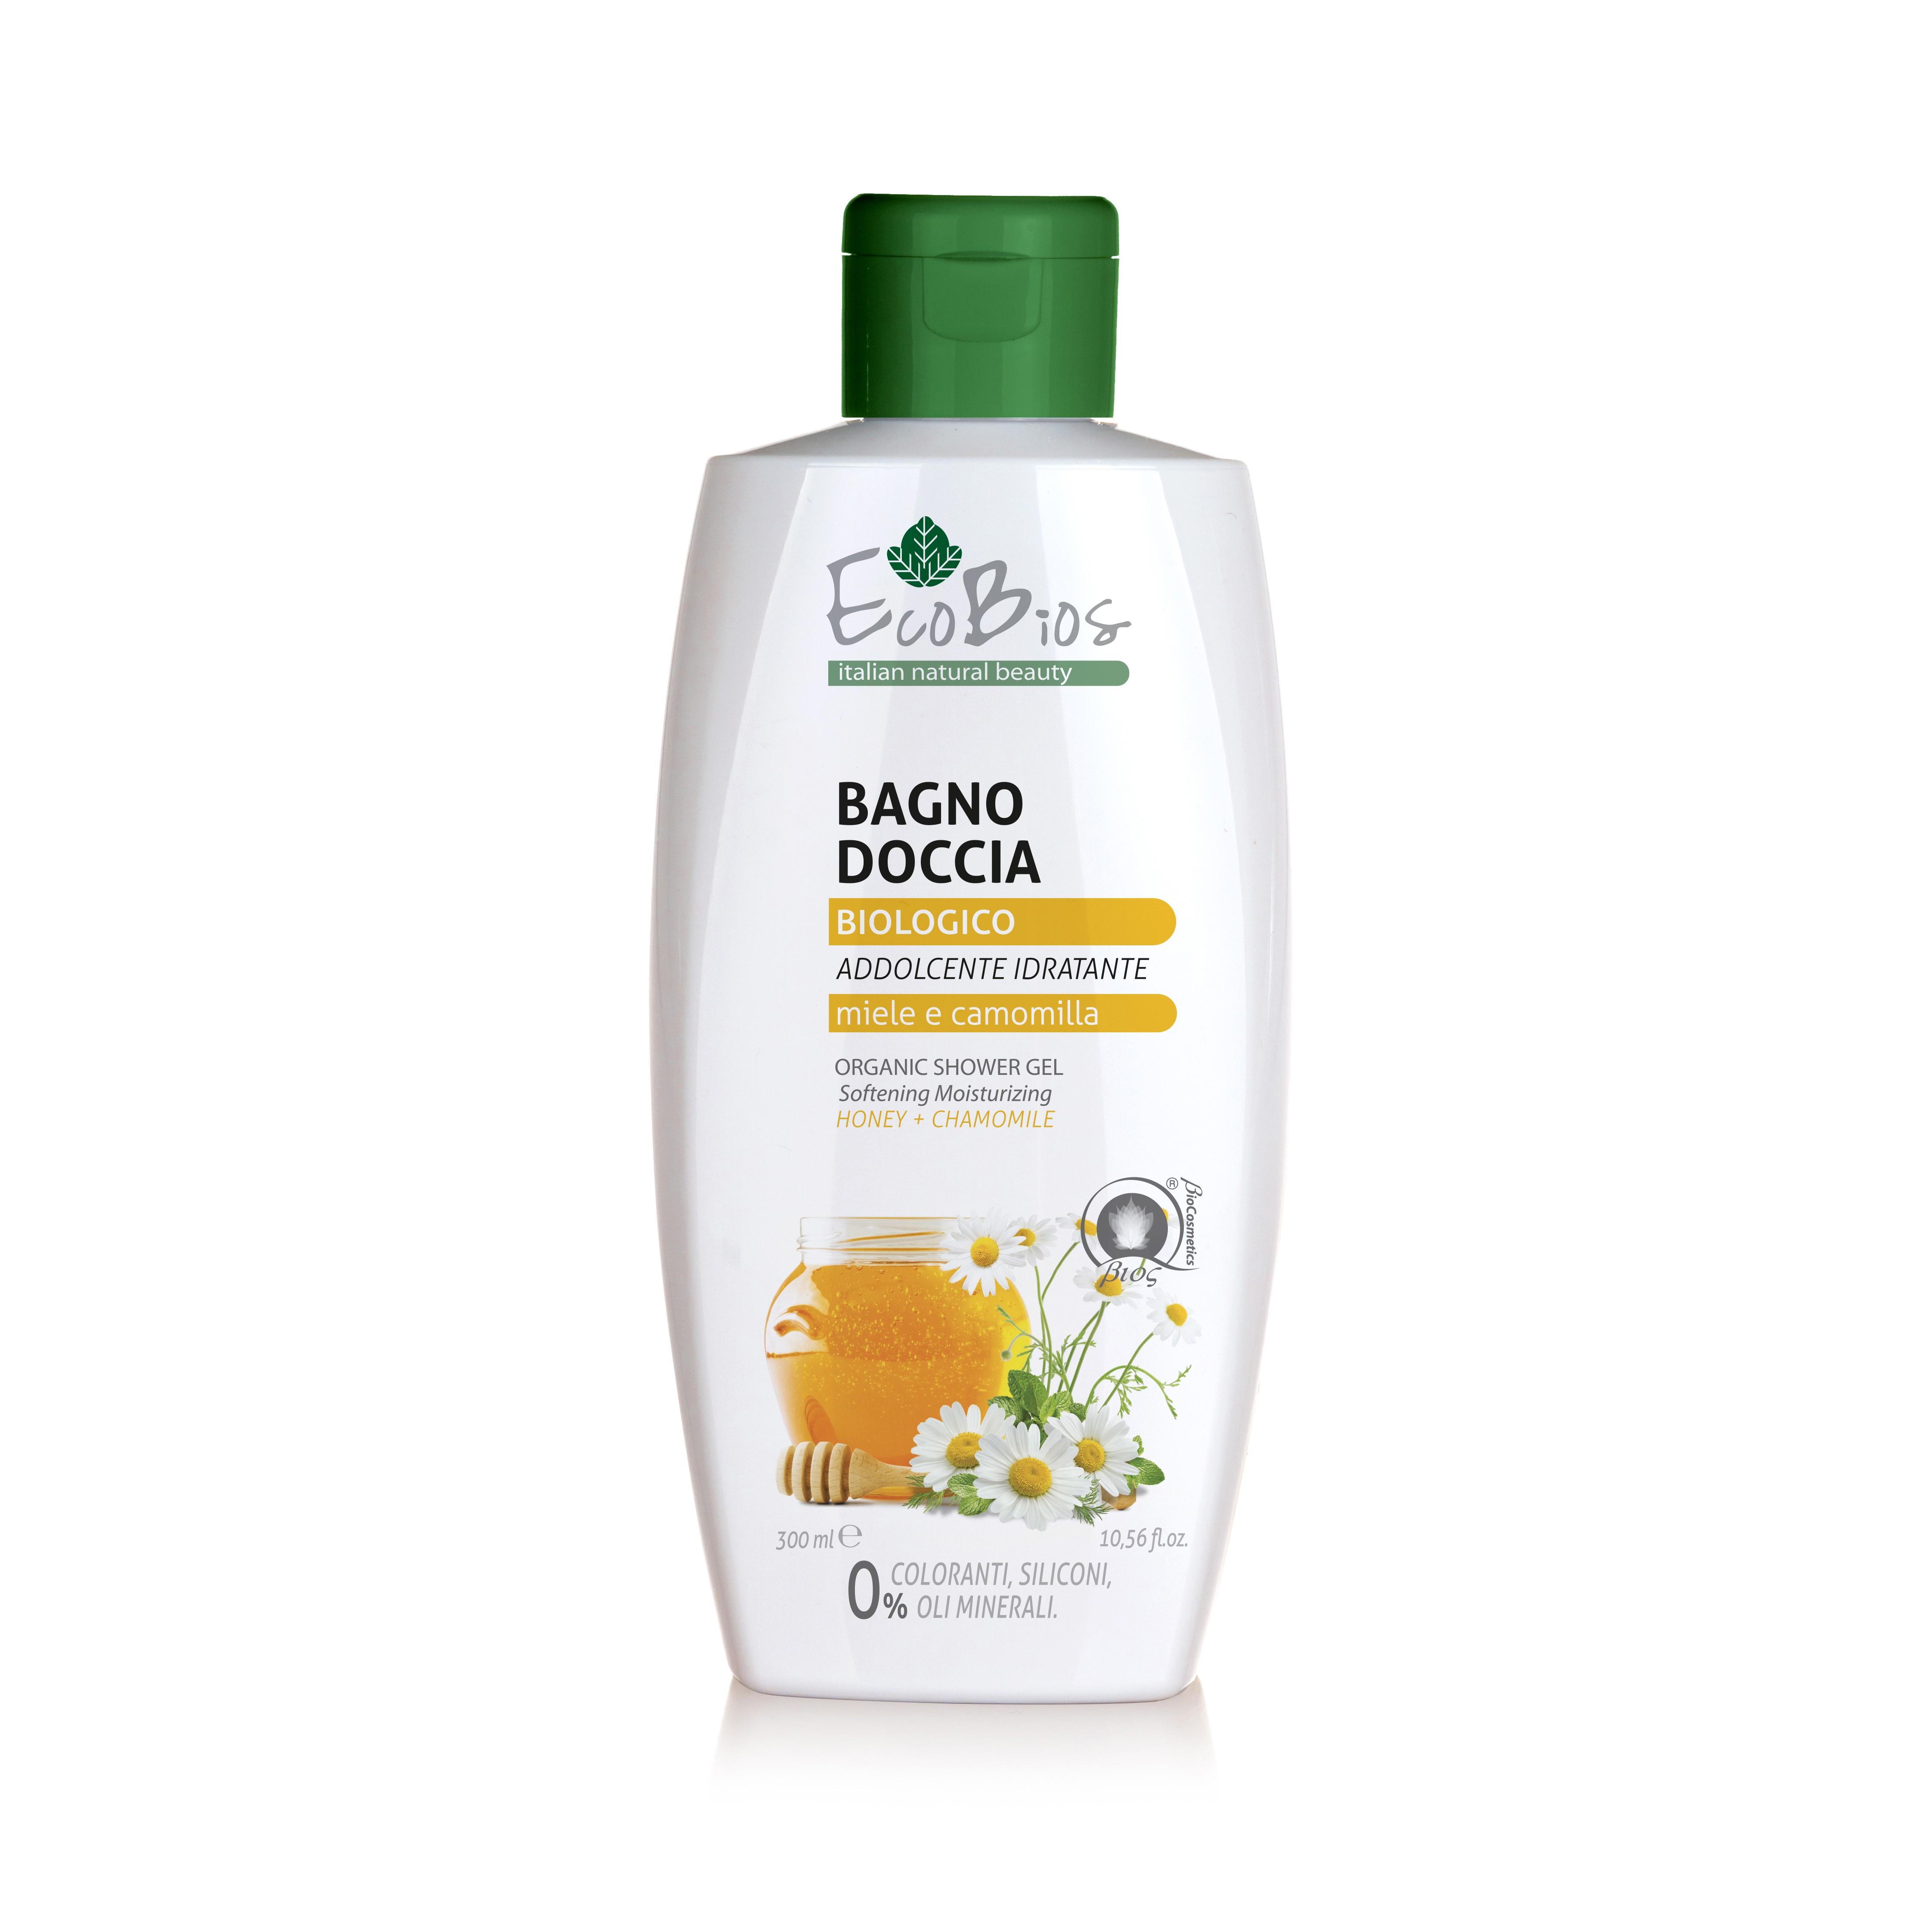 EcoBiOs洋甘菊蜂蜜沐浴露 300ml